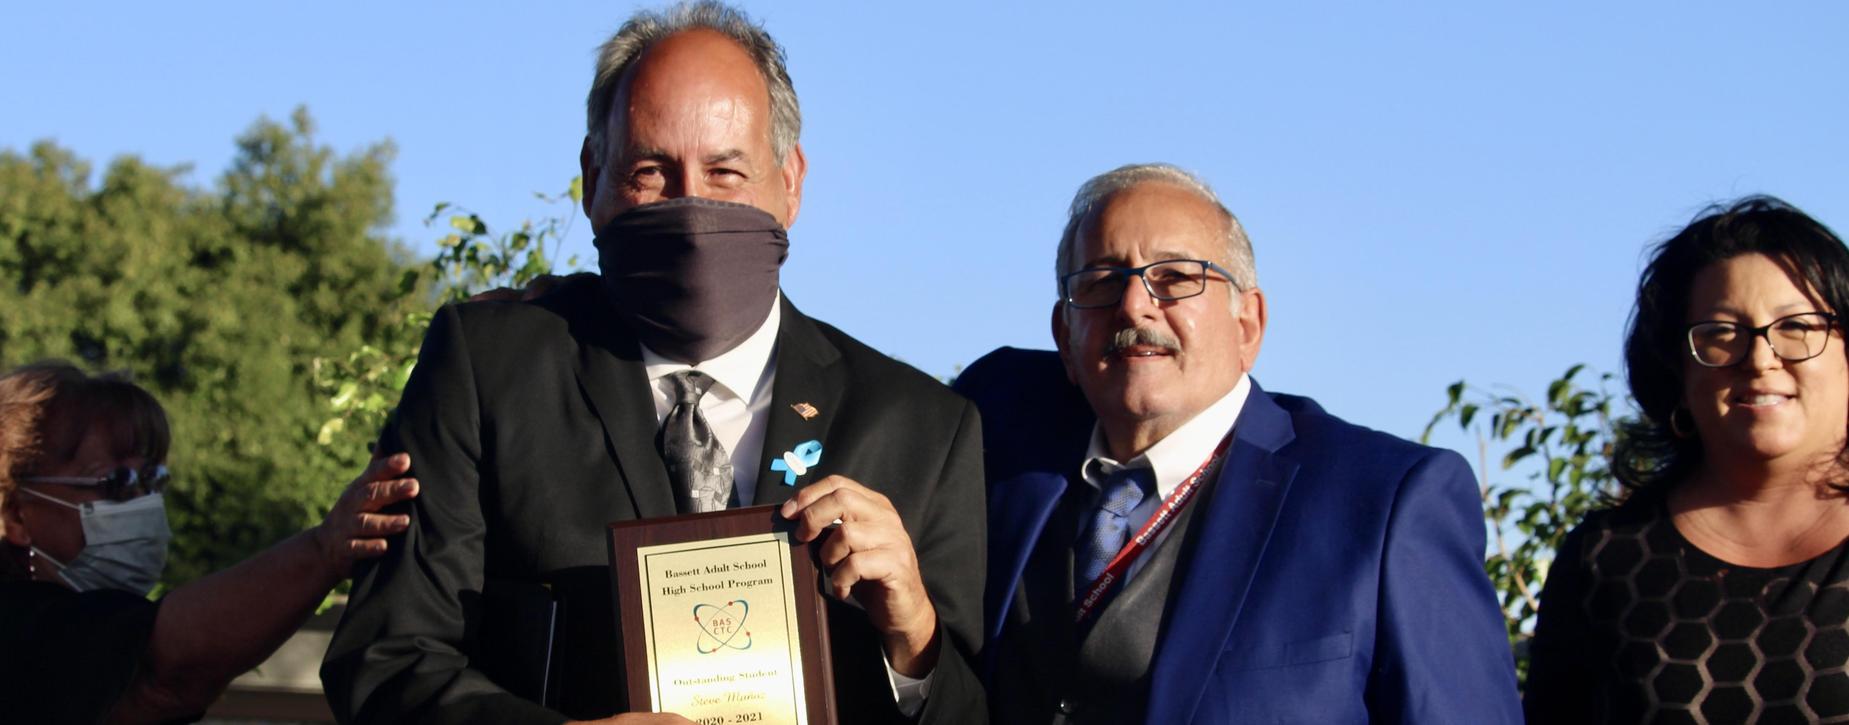 Mr. Munoz accepting Teacher of the Year award